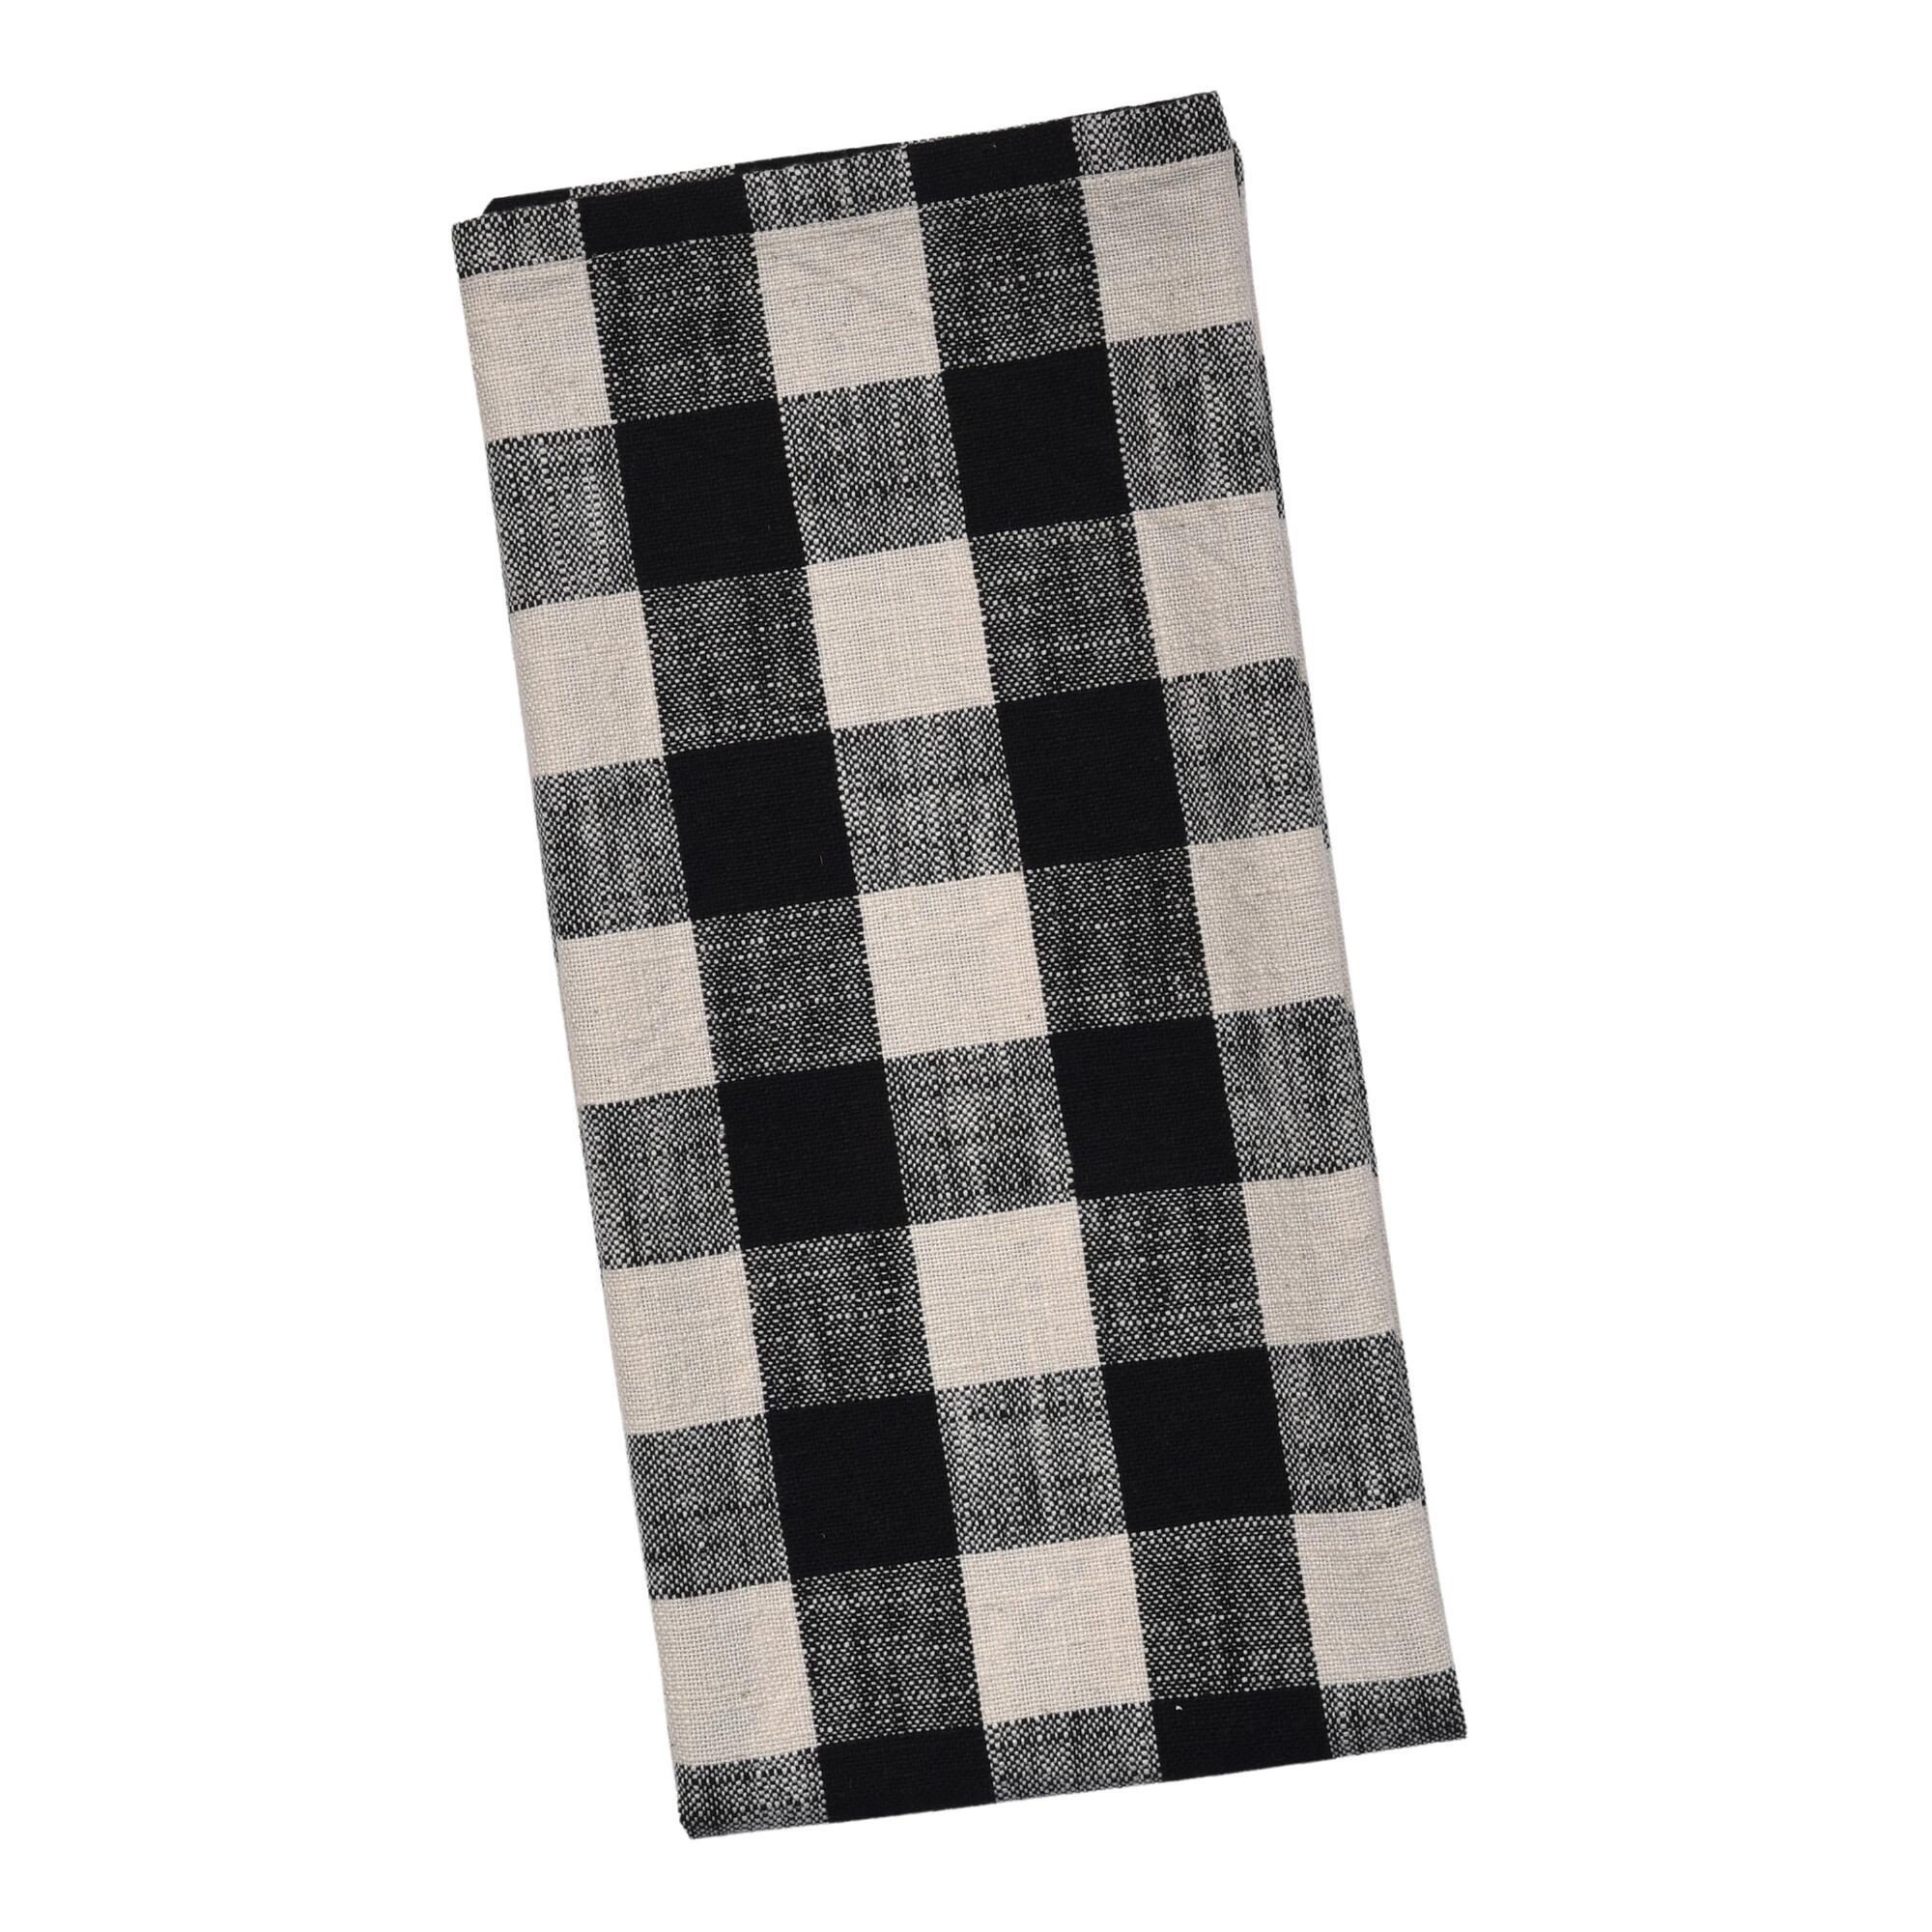 Black And Ivory Buffalo Check Kitchen Towel Set Of 2 $9.98